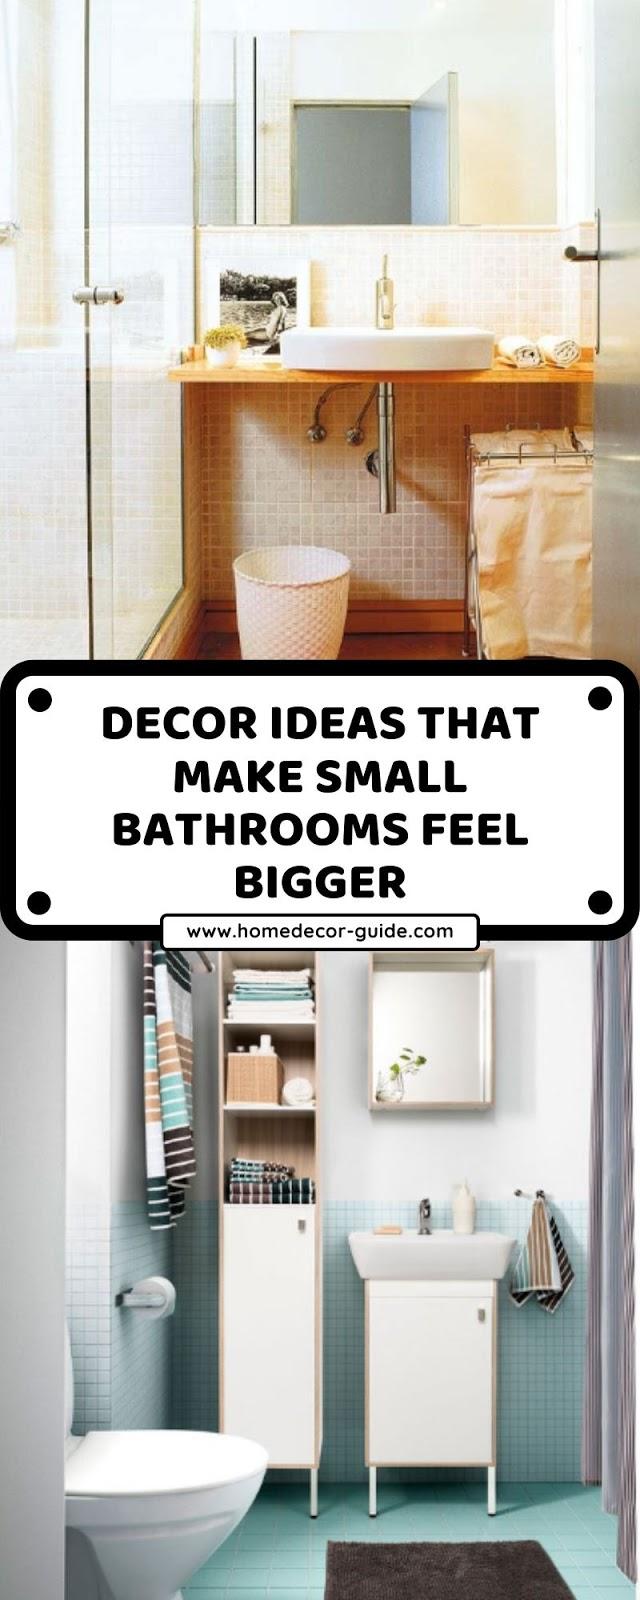 DECOR IDEAS THAT MAKE SMALL BATHROOMS FEEL BIGGER